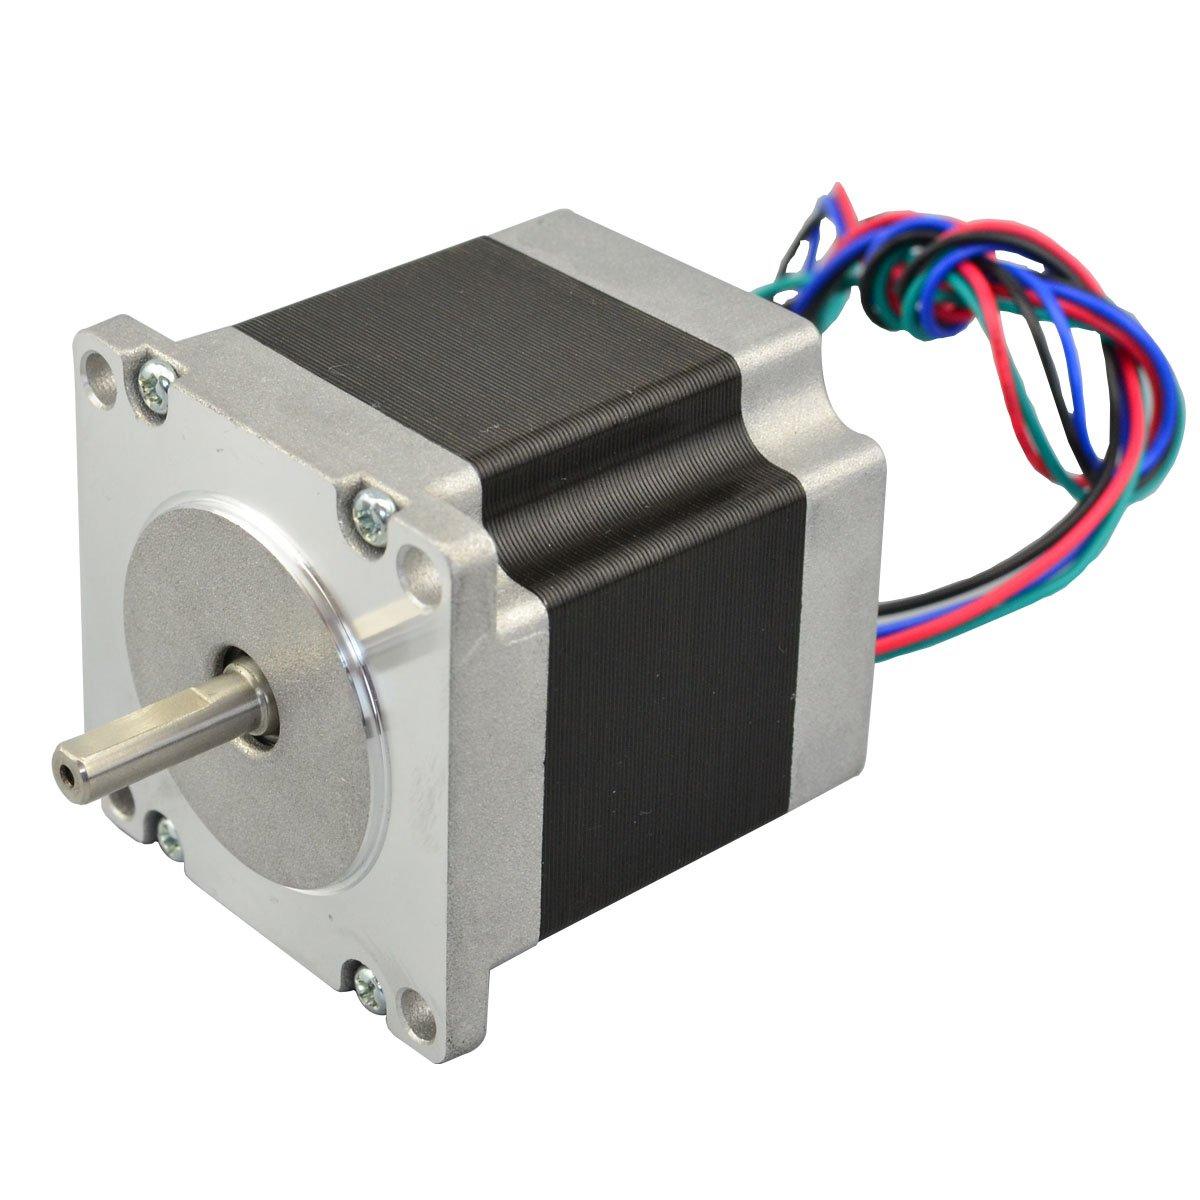 Nema 23 Stepper Motor 126nm 28a 4 Wires 635mm Shaft Diy Cnc Robot Wire Diagram 3d Printer